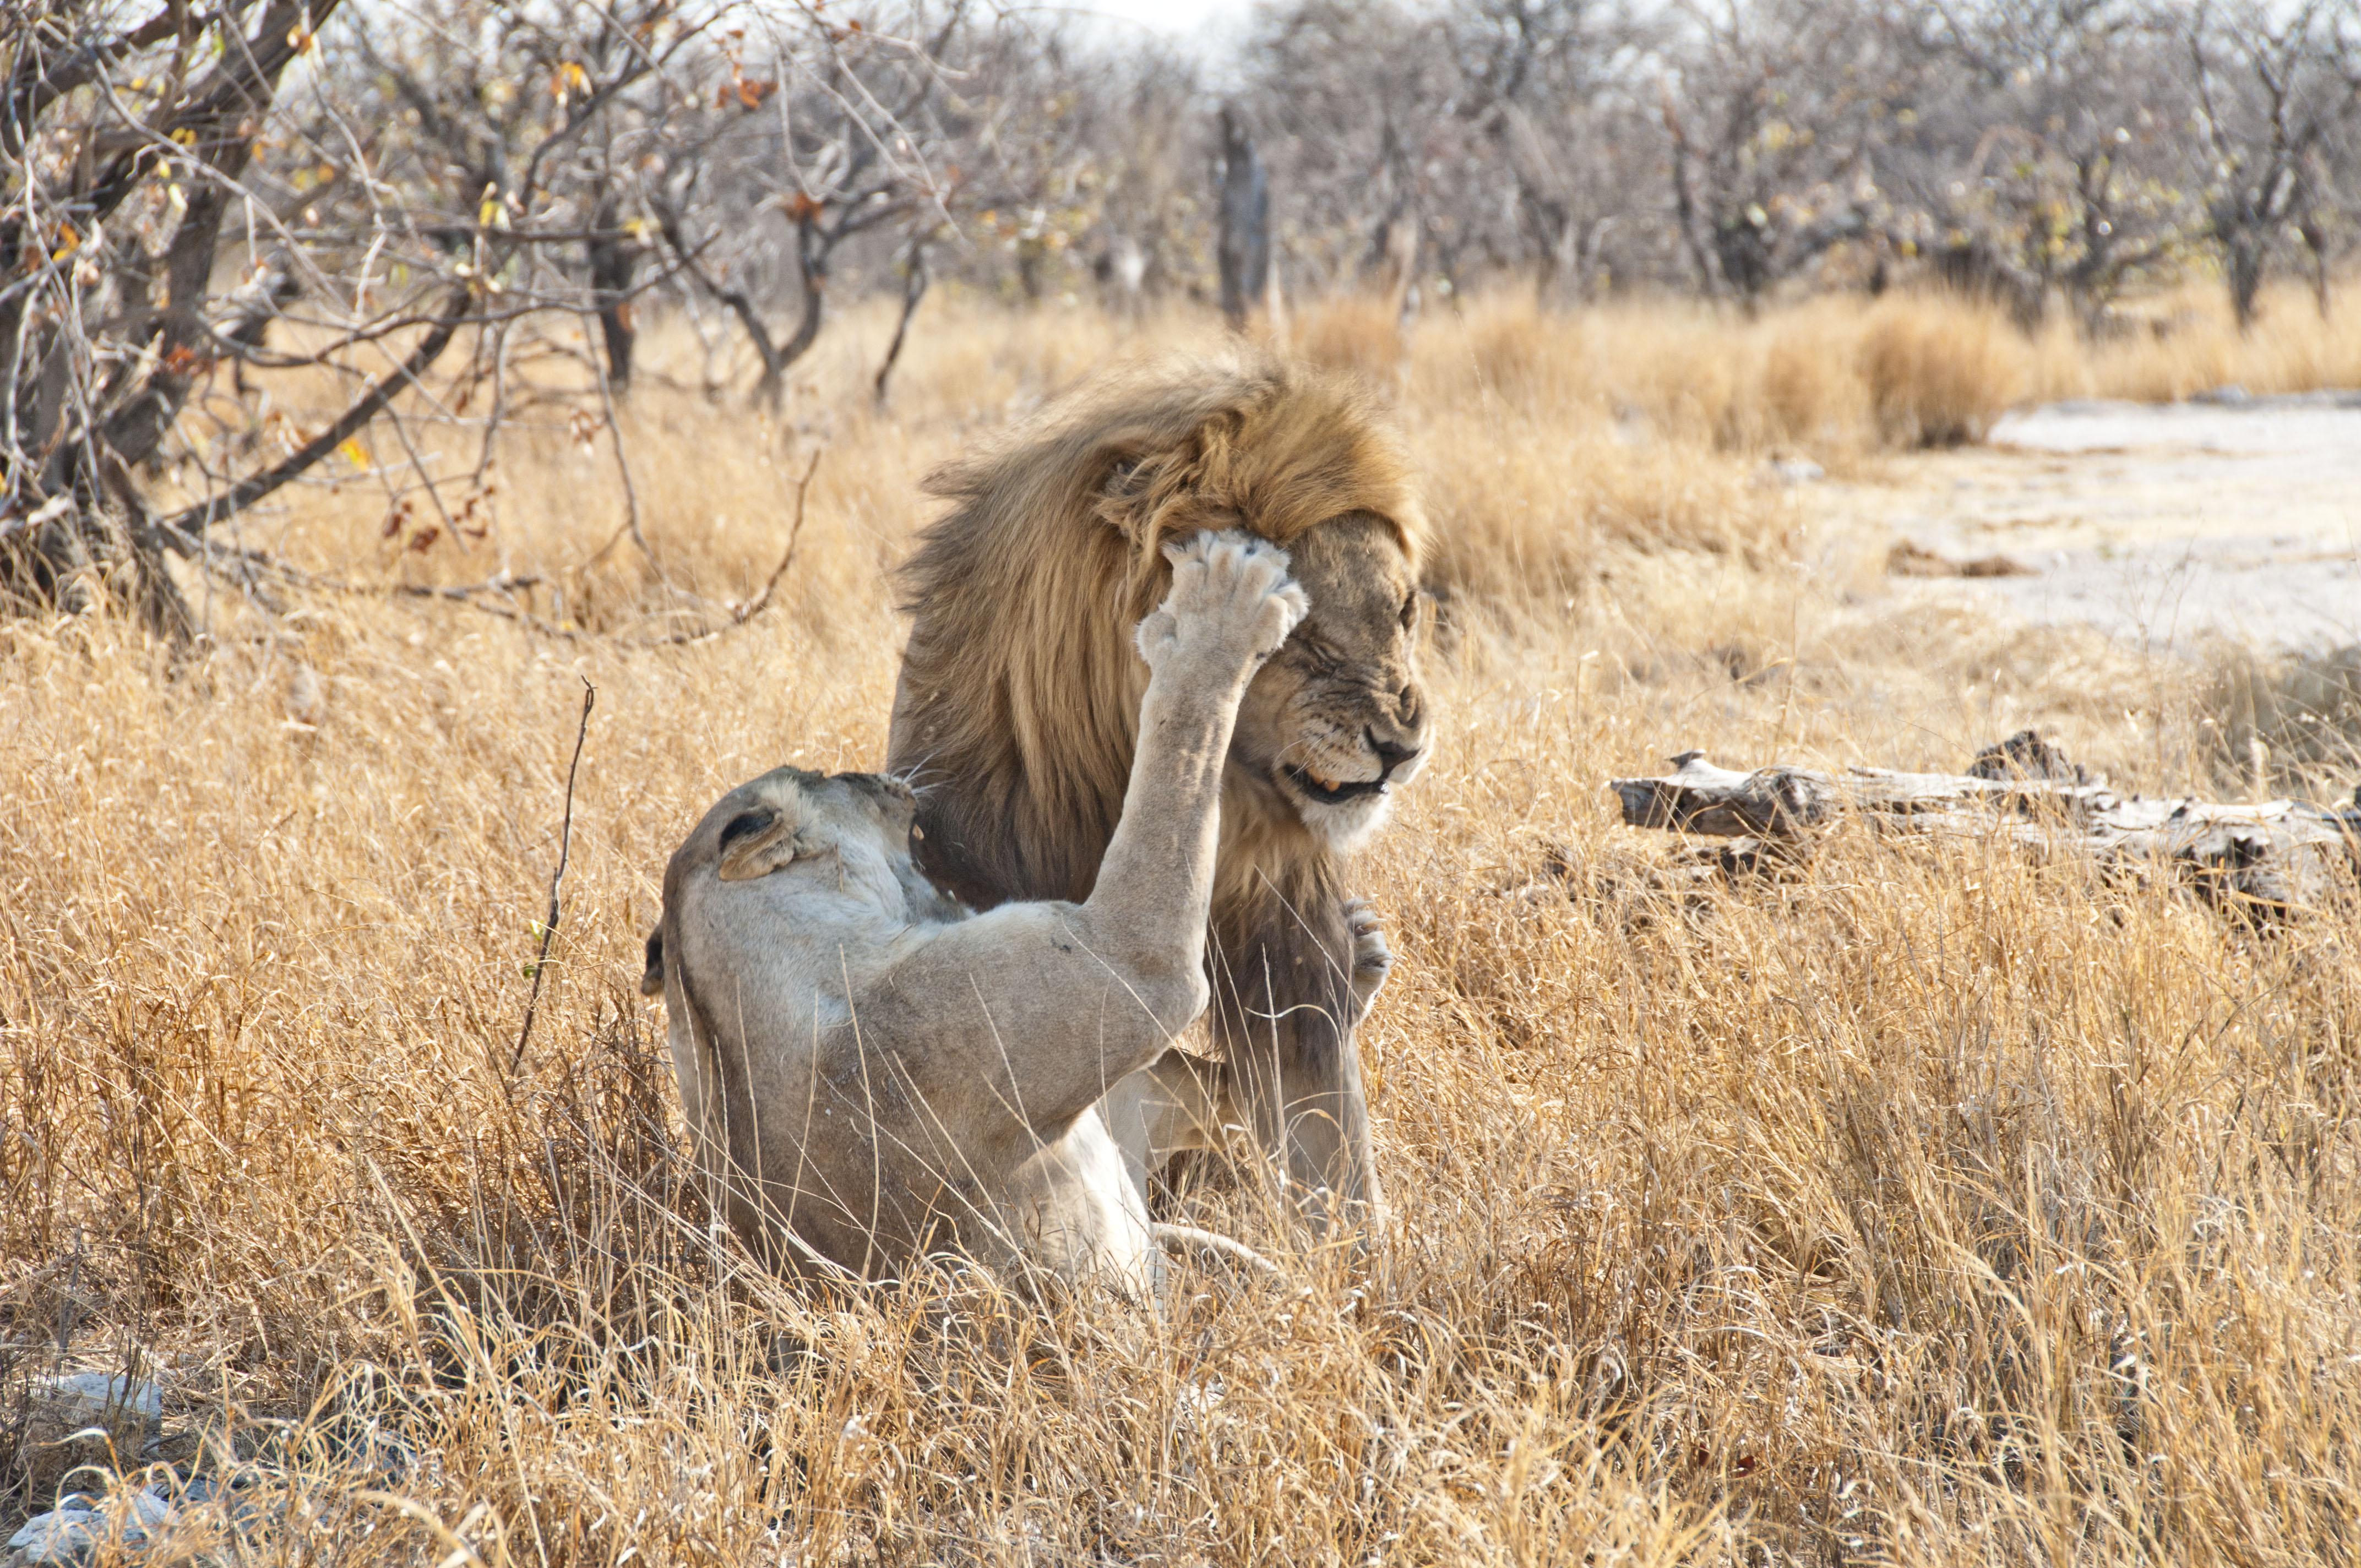 namibia_2014_kaokoveld-etoscha_110